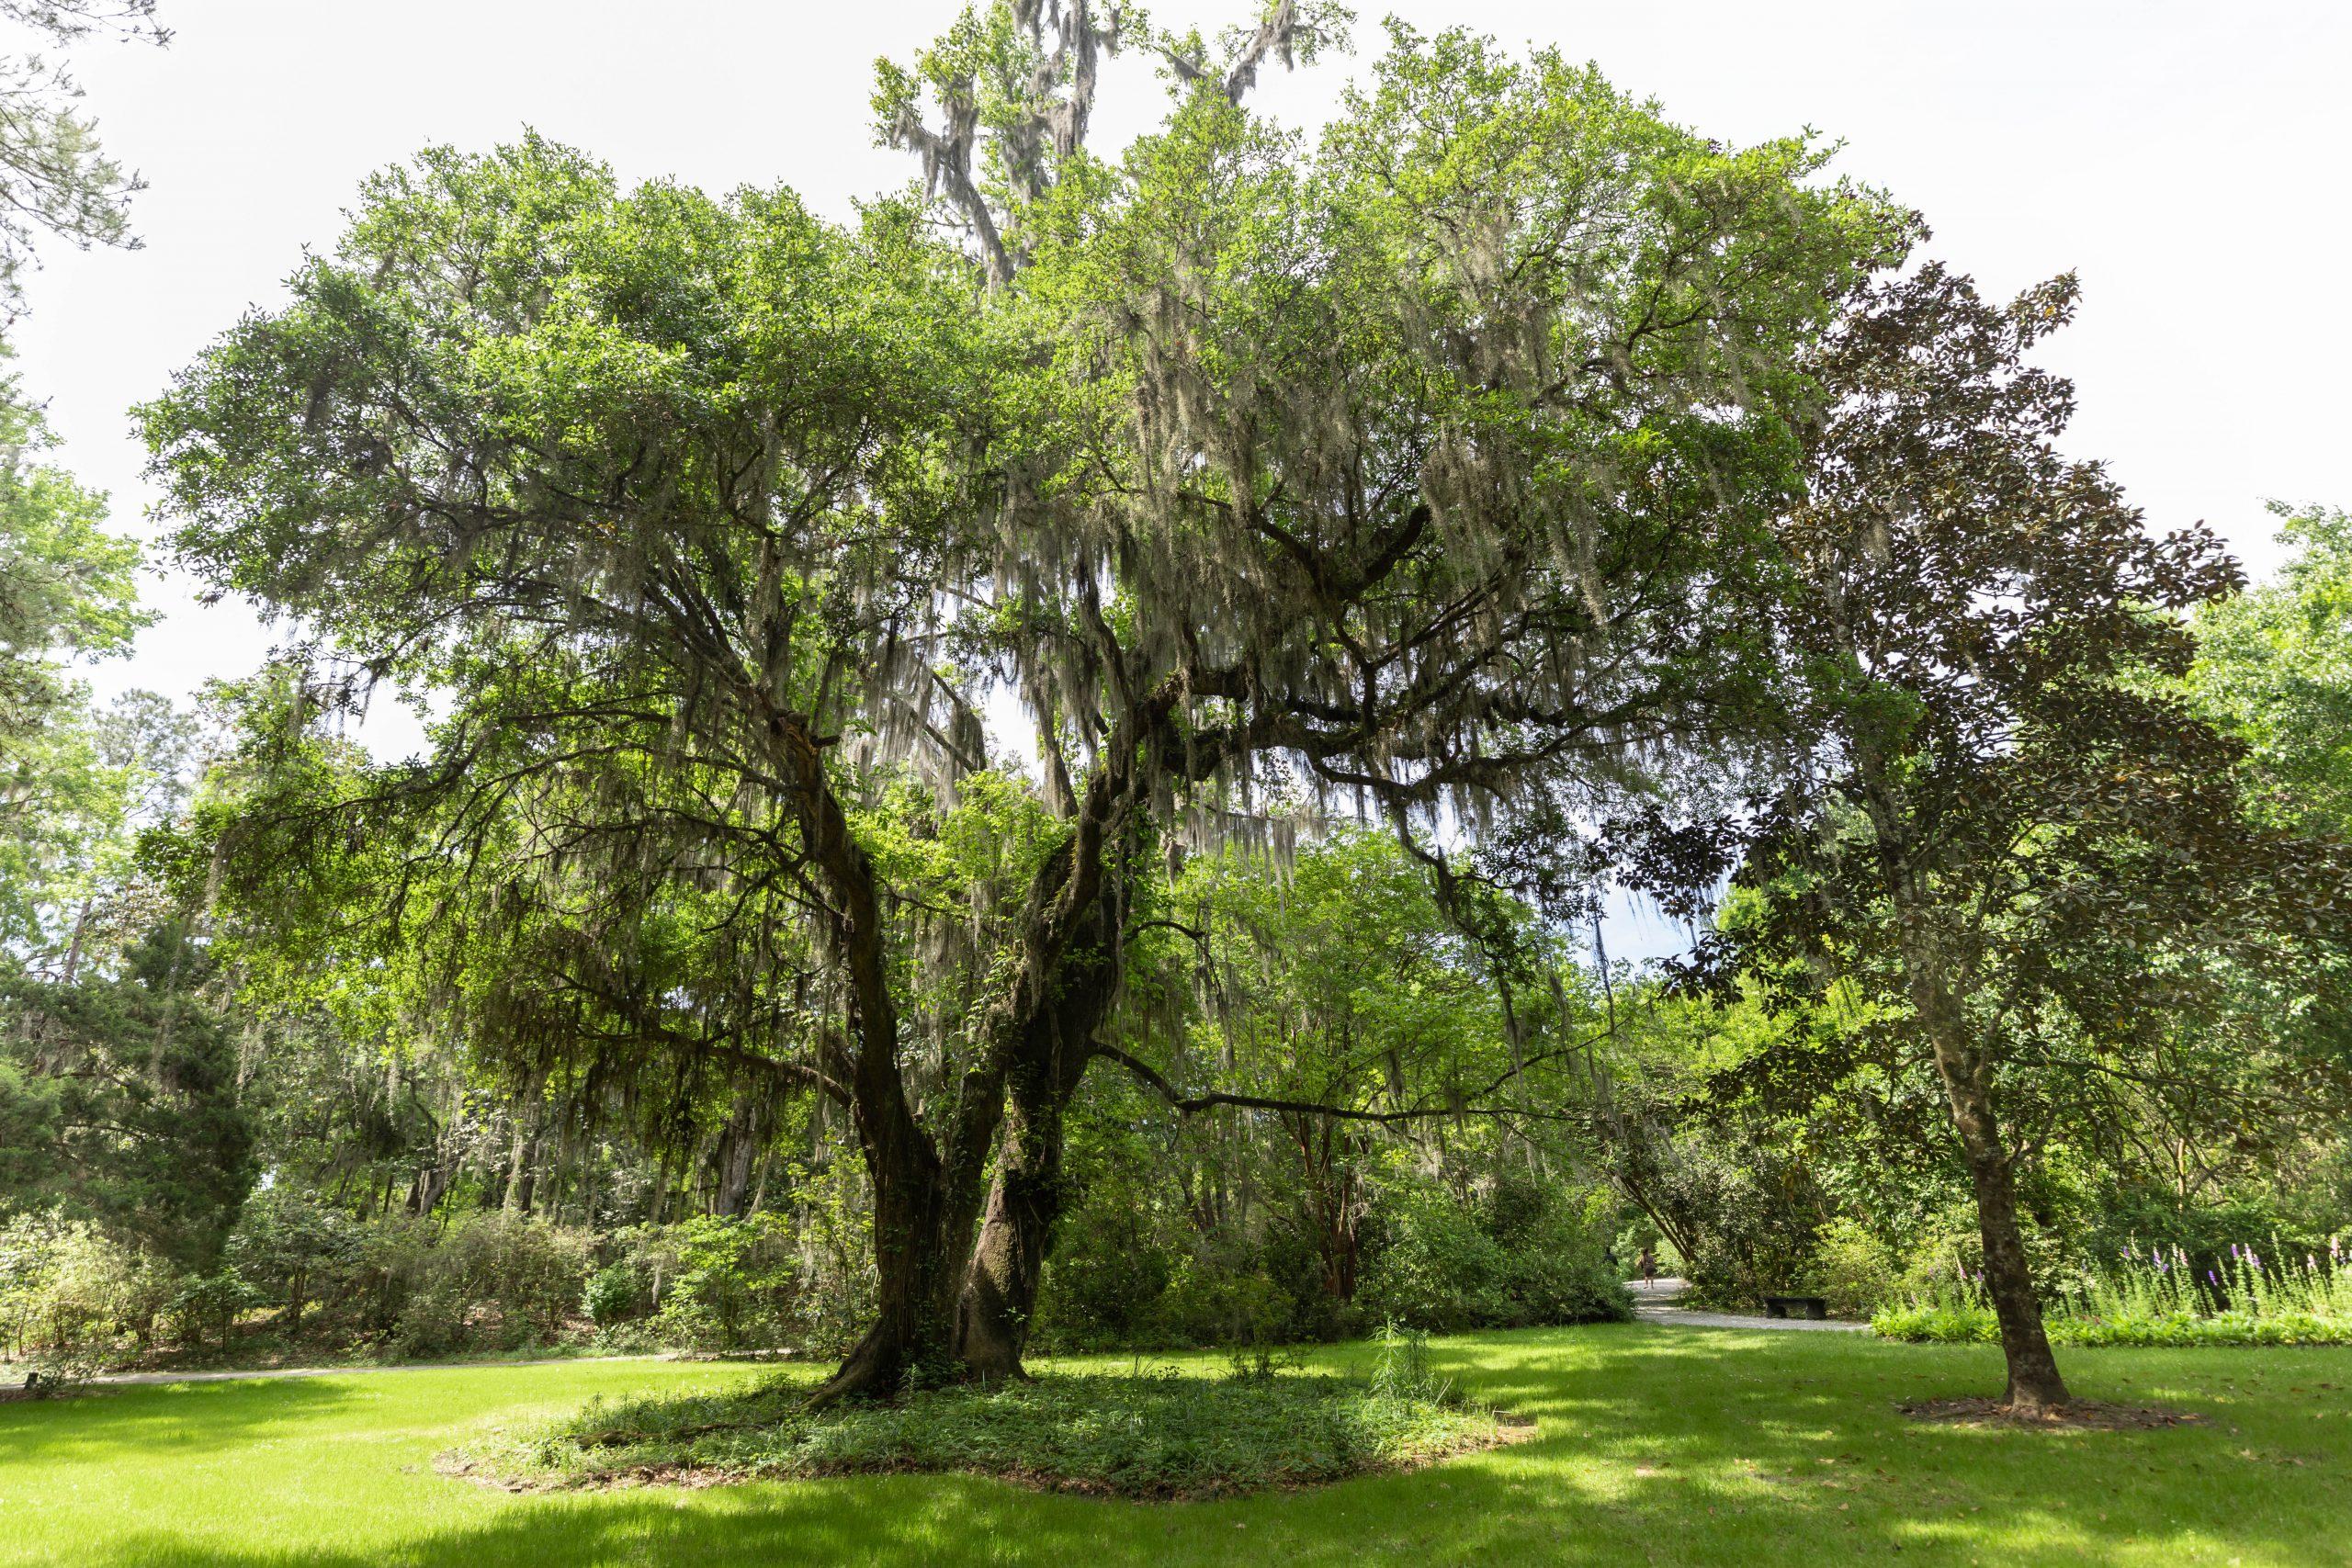 Live Oak Tree at Magnolia Plantation & Gardens in Charleston South Carolina Written & Photographed by Annie Fairfax